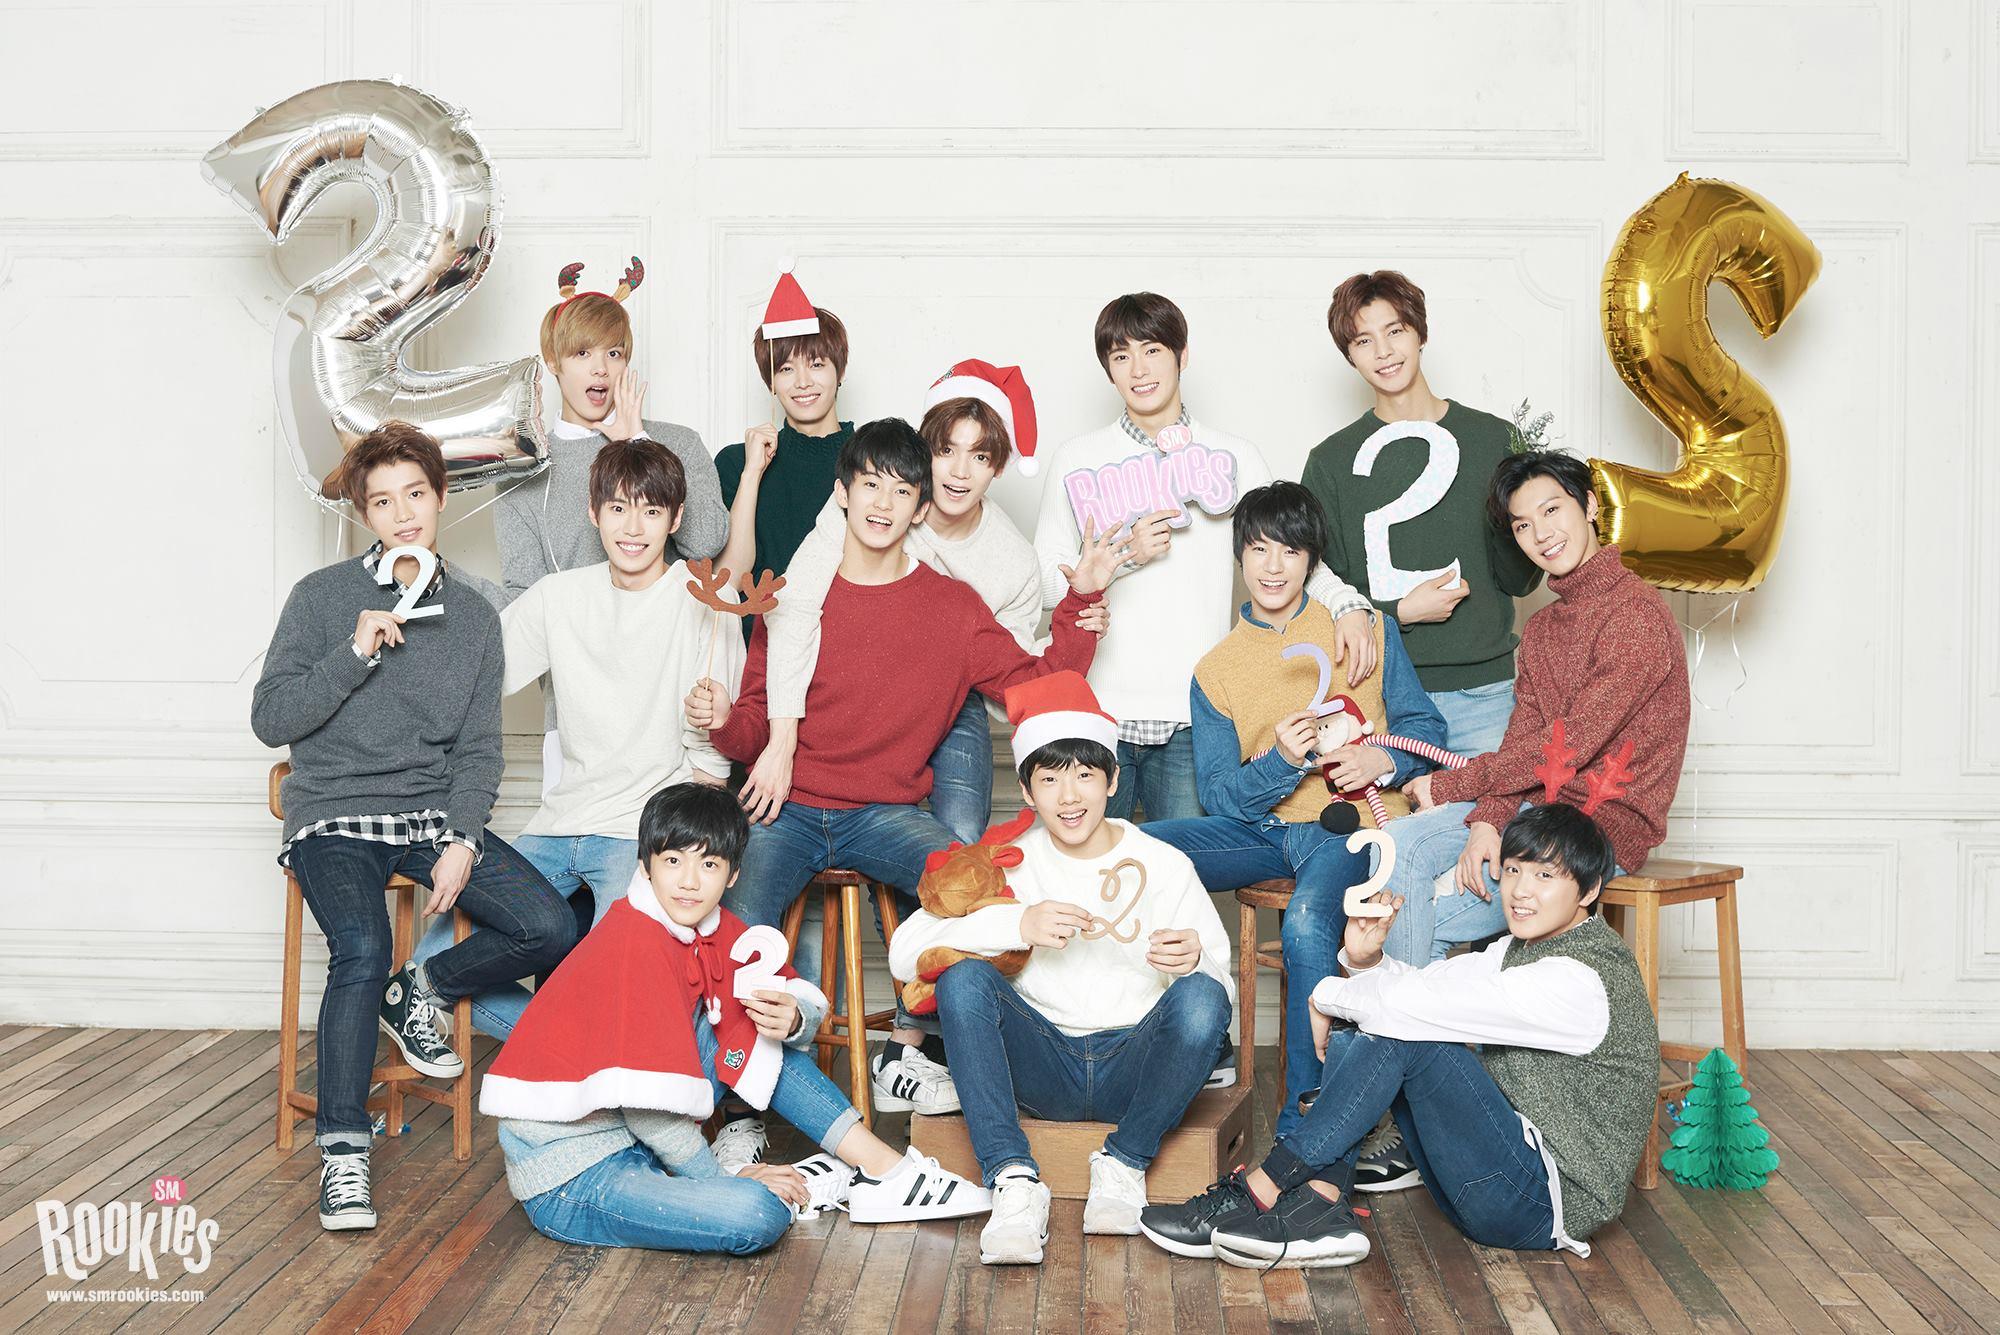 ★ SM 娛樂的新男團  目前只有消息說 SM 娛樂明年要推出一個新男團,但還沒有公布成員和出道時間。